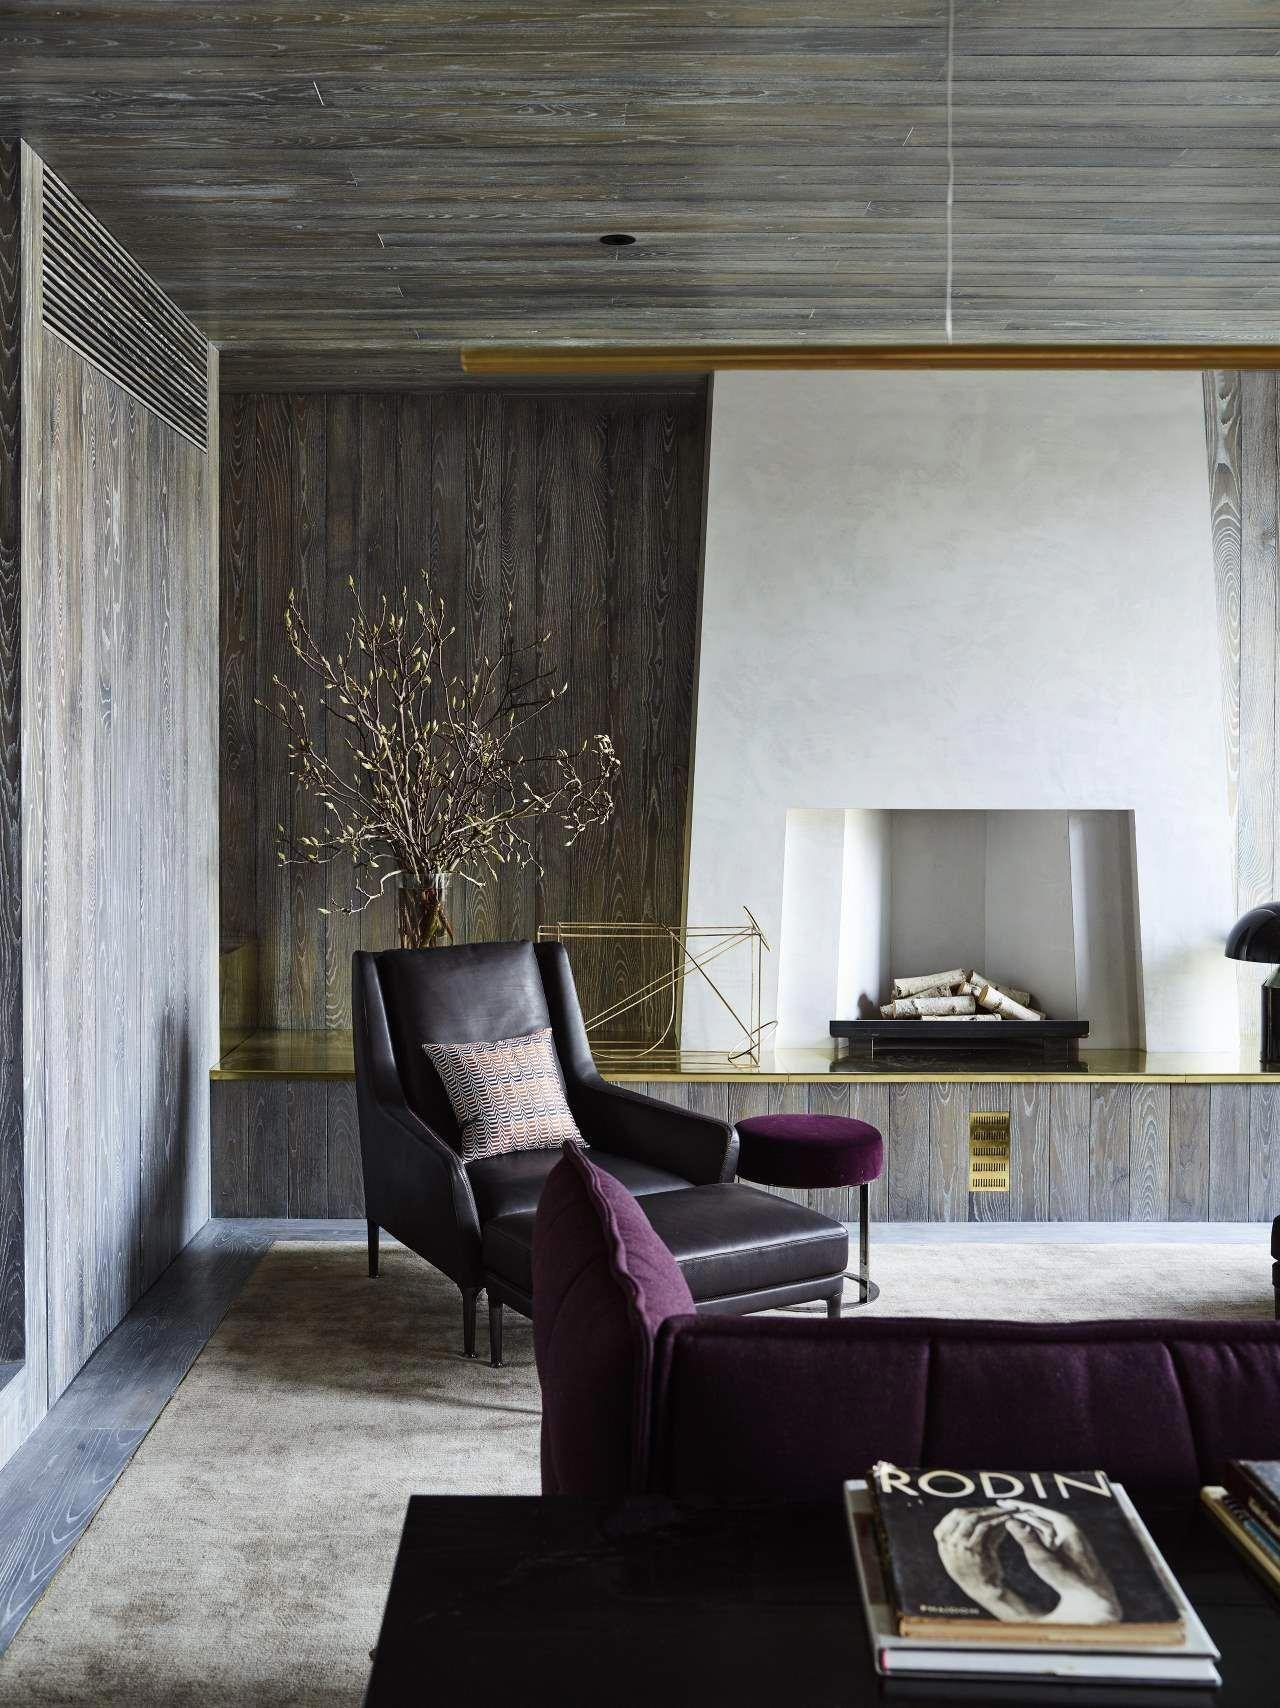 Photo mark roper architecture  interiors rob mills sweet home make interior decoration design ideas decor styles also rh pinterest